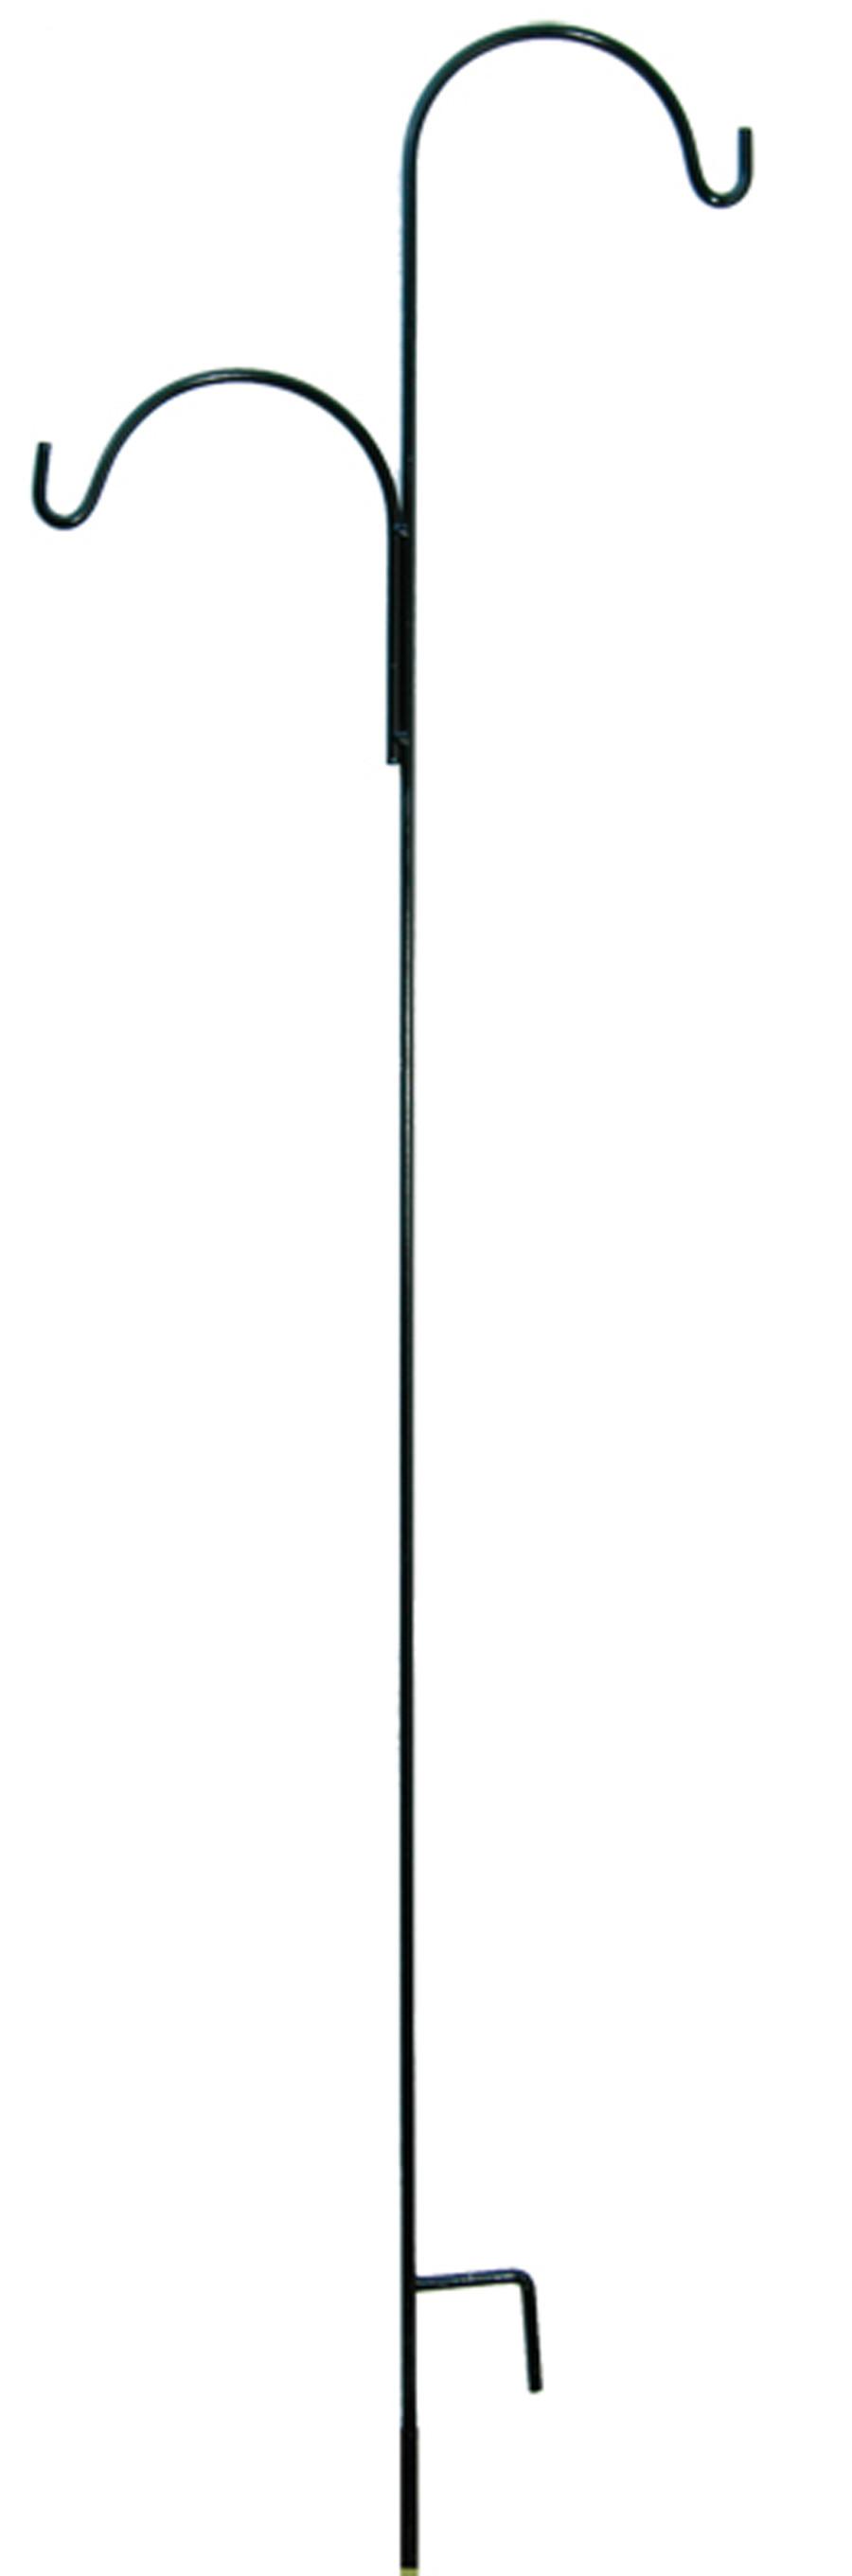 American GardenWorks Tall Hangers Offset Black 10ea/90Inx24 in